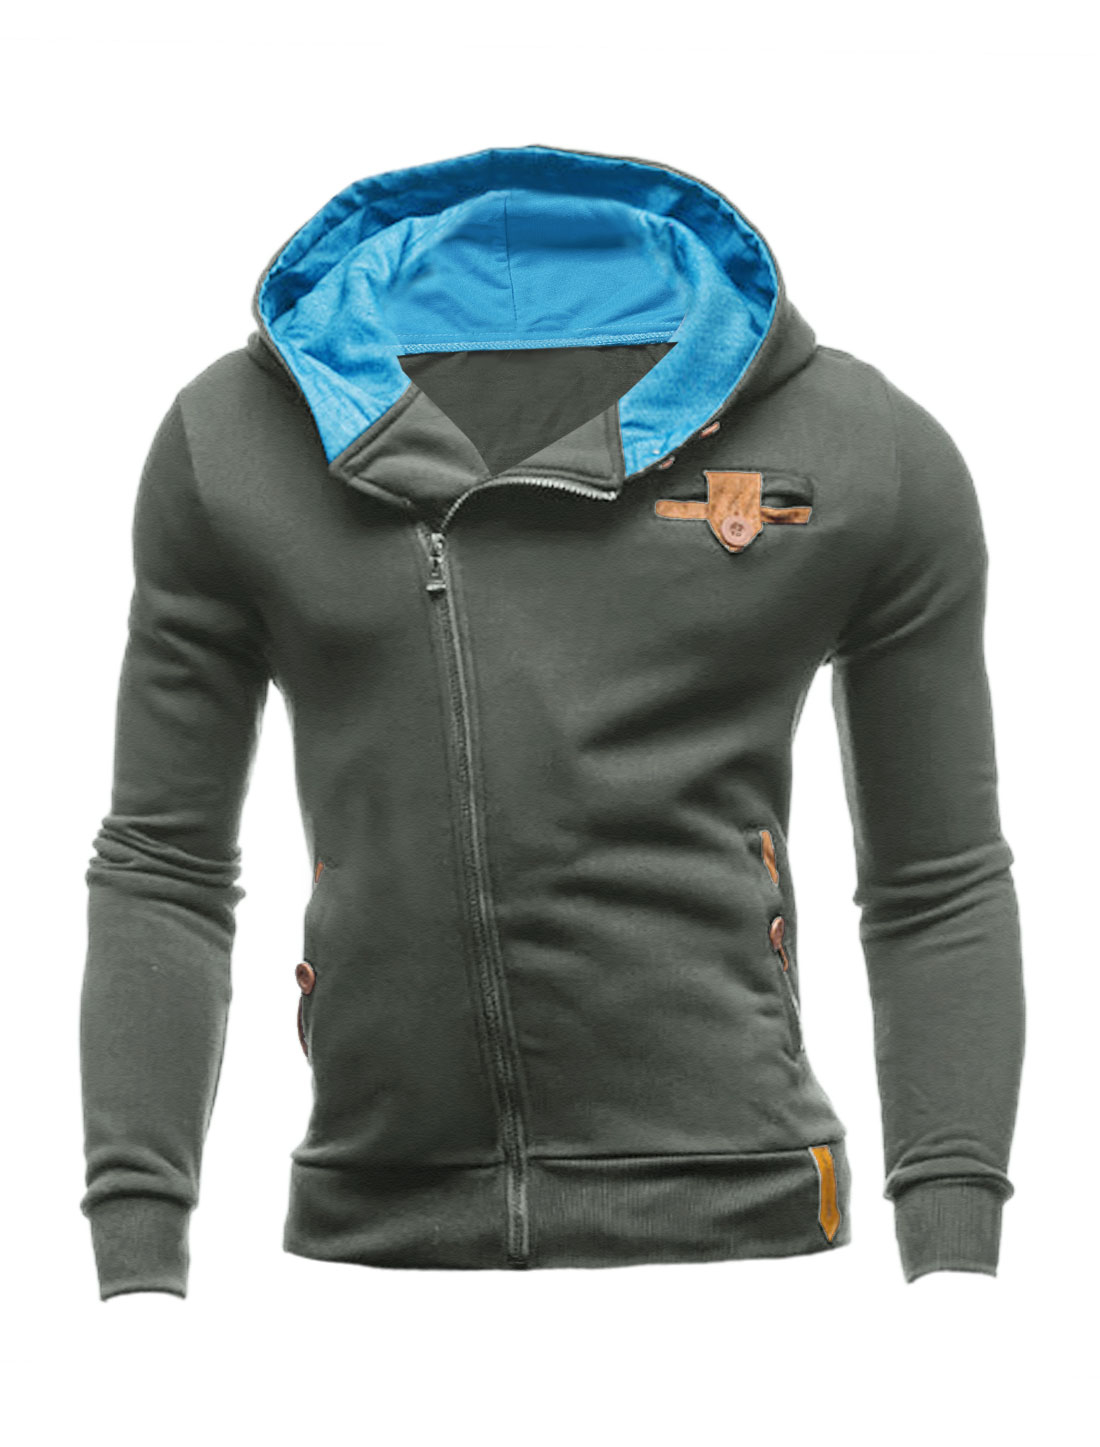 Men Inclined Zipper Closed Slant Pockets Hooded Sweatshirt Cool Gray M